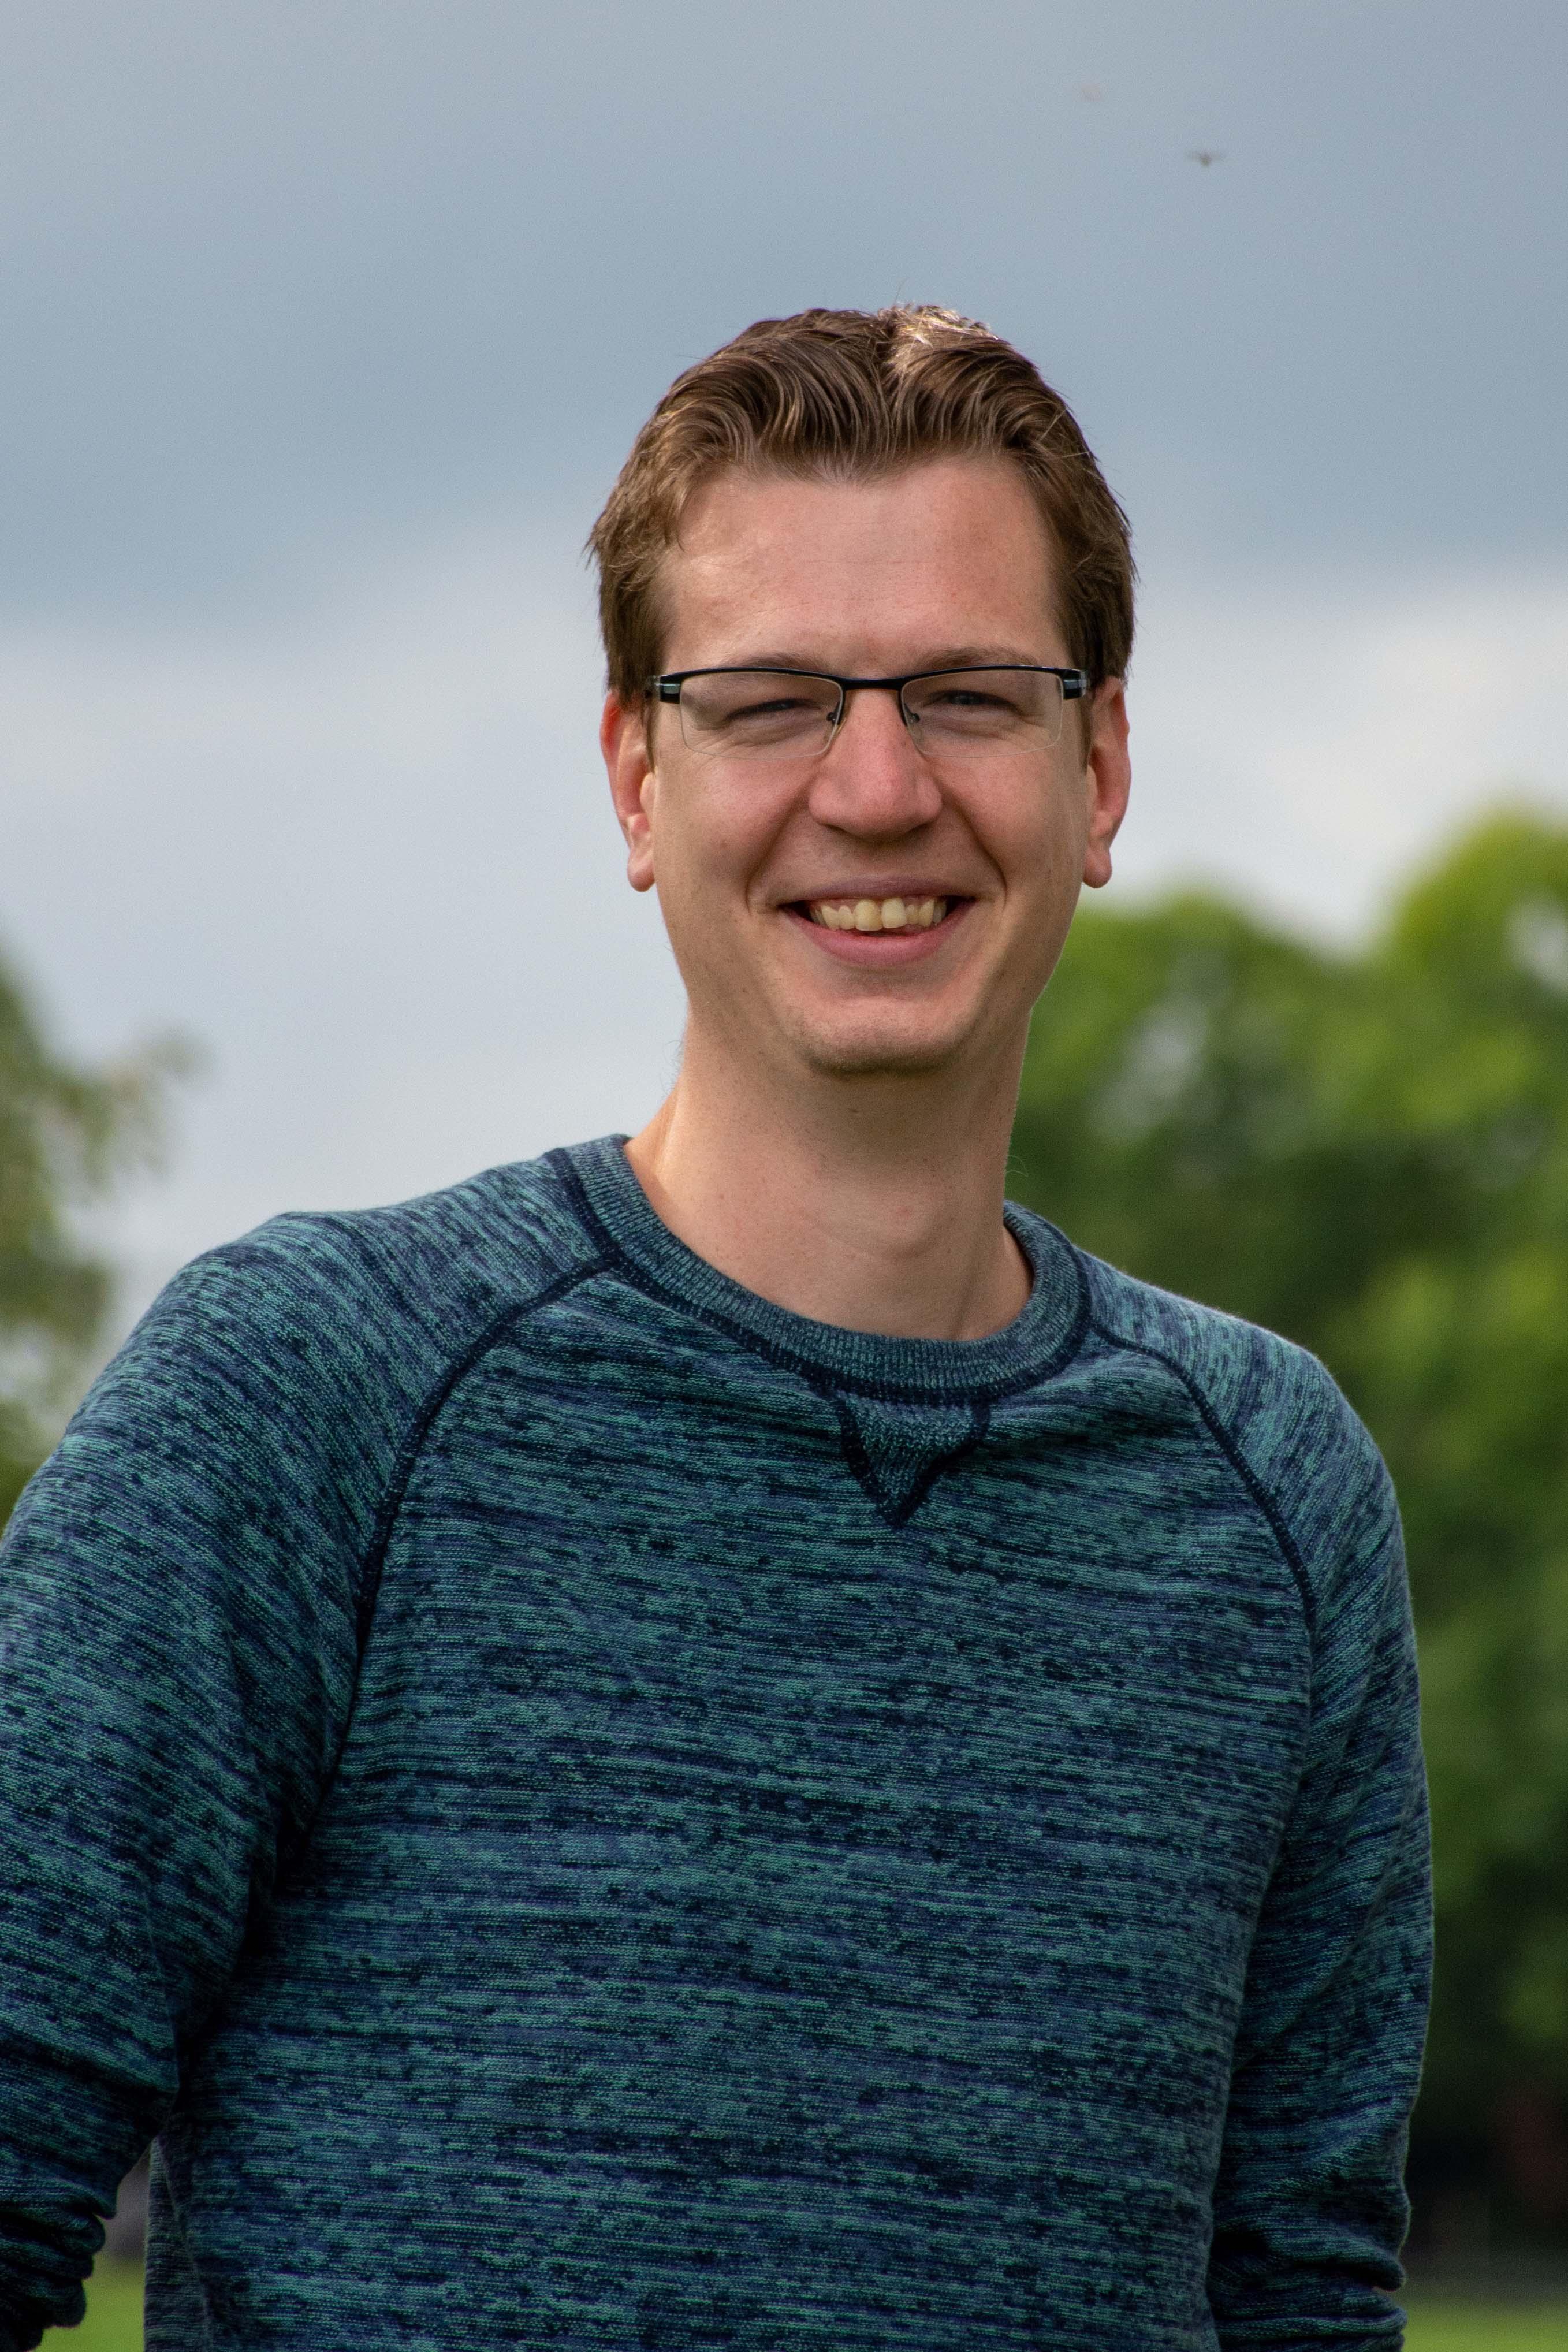 Gijsbert Thomassen